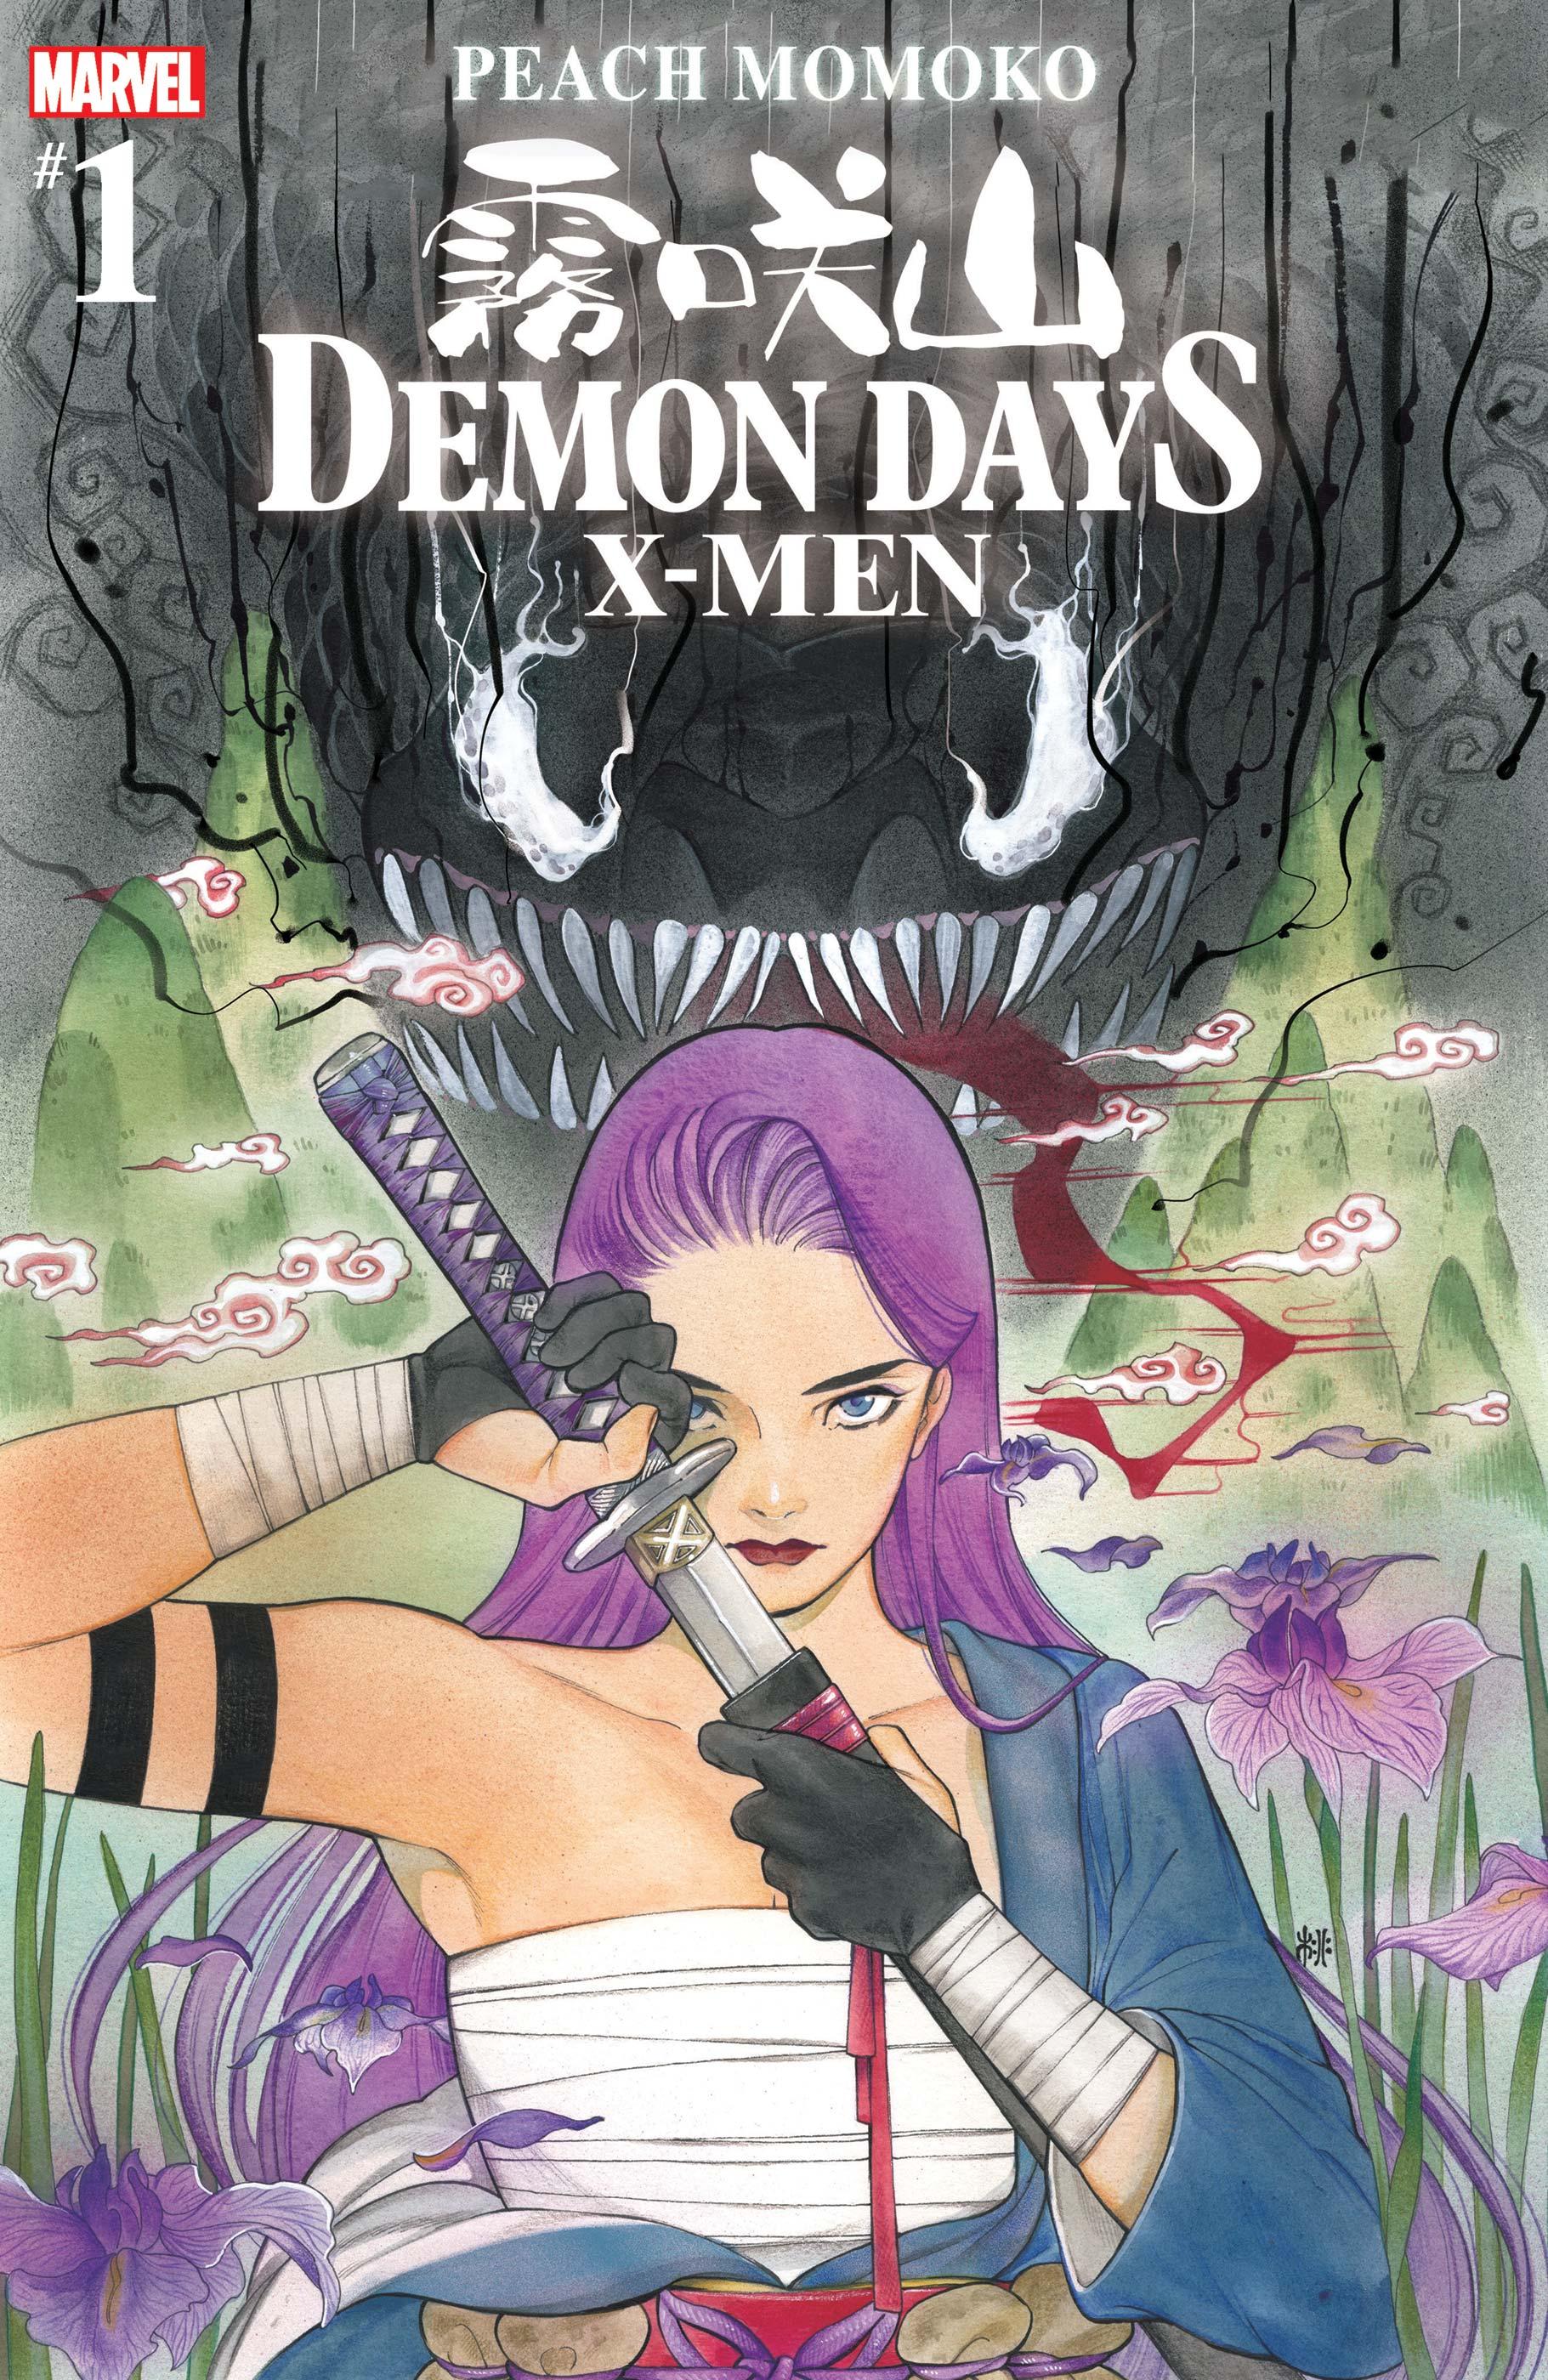 Demon Days: X-Men #1 Cover by Peach Momoko